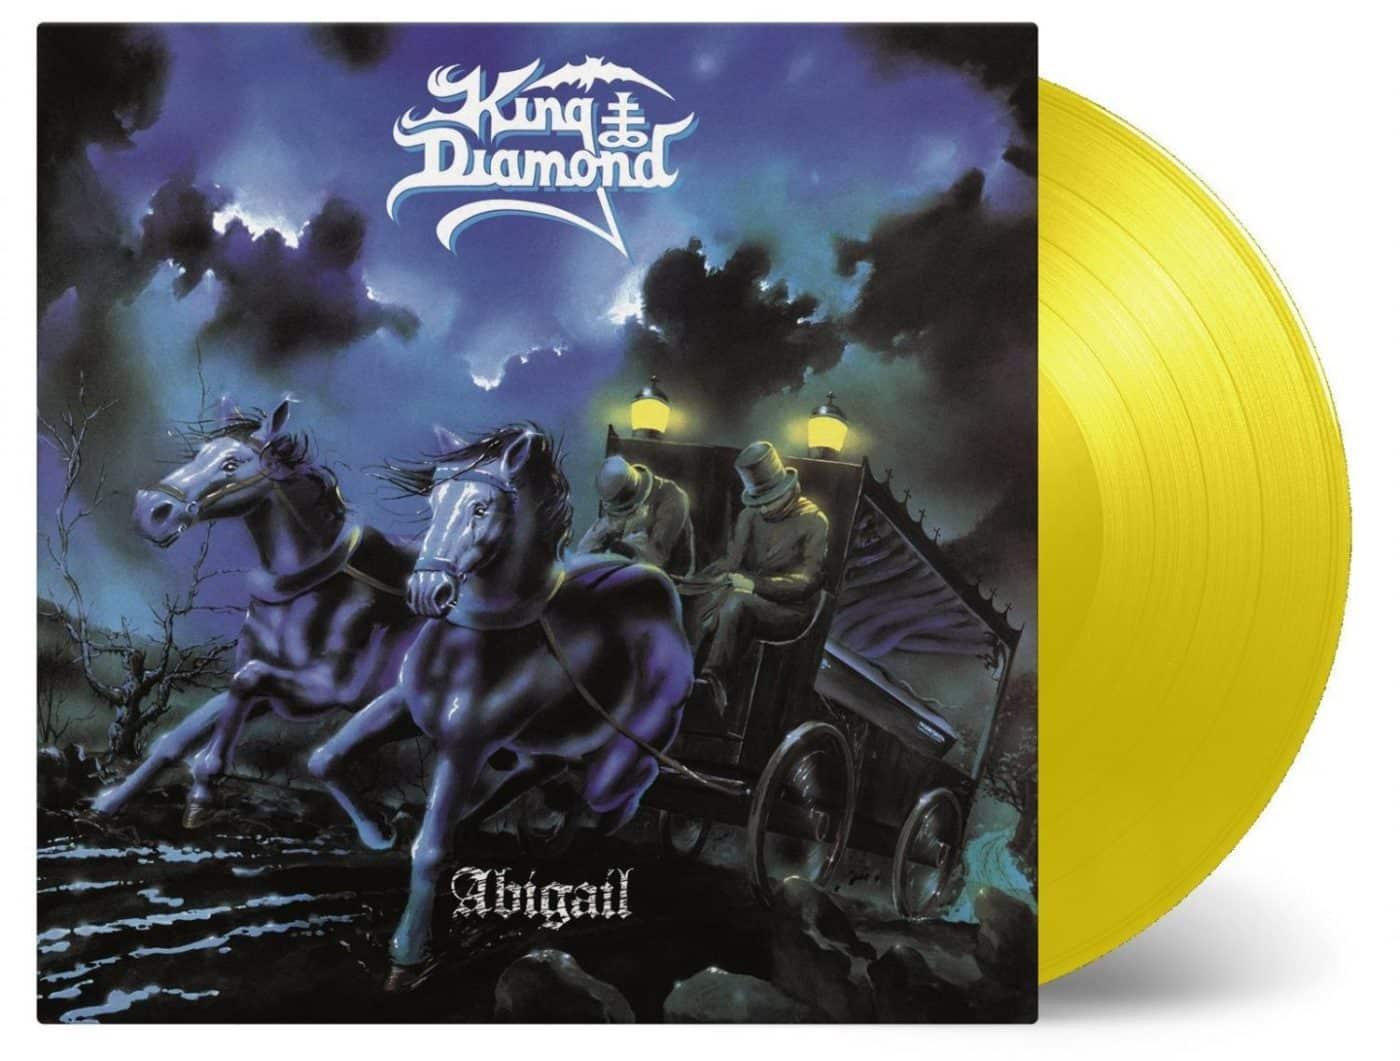 King Diamond - Abigail (Vinyl)